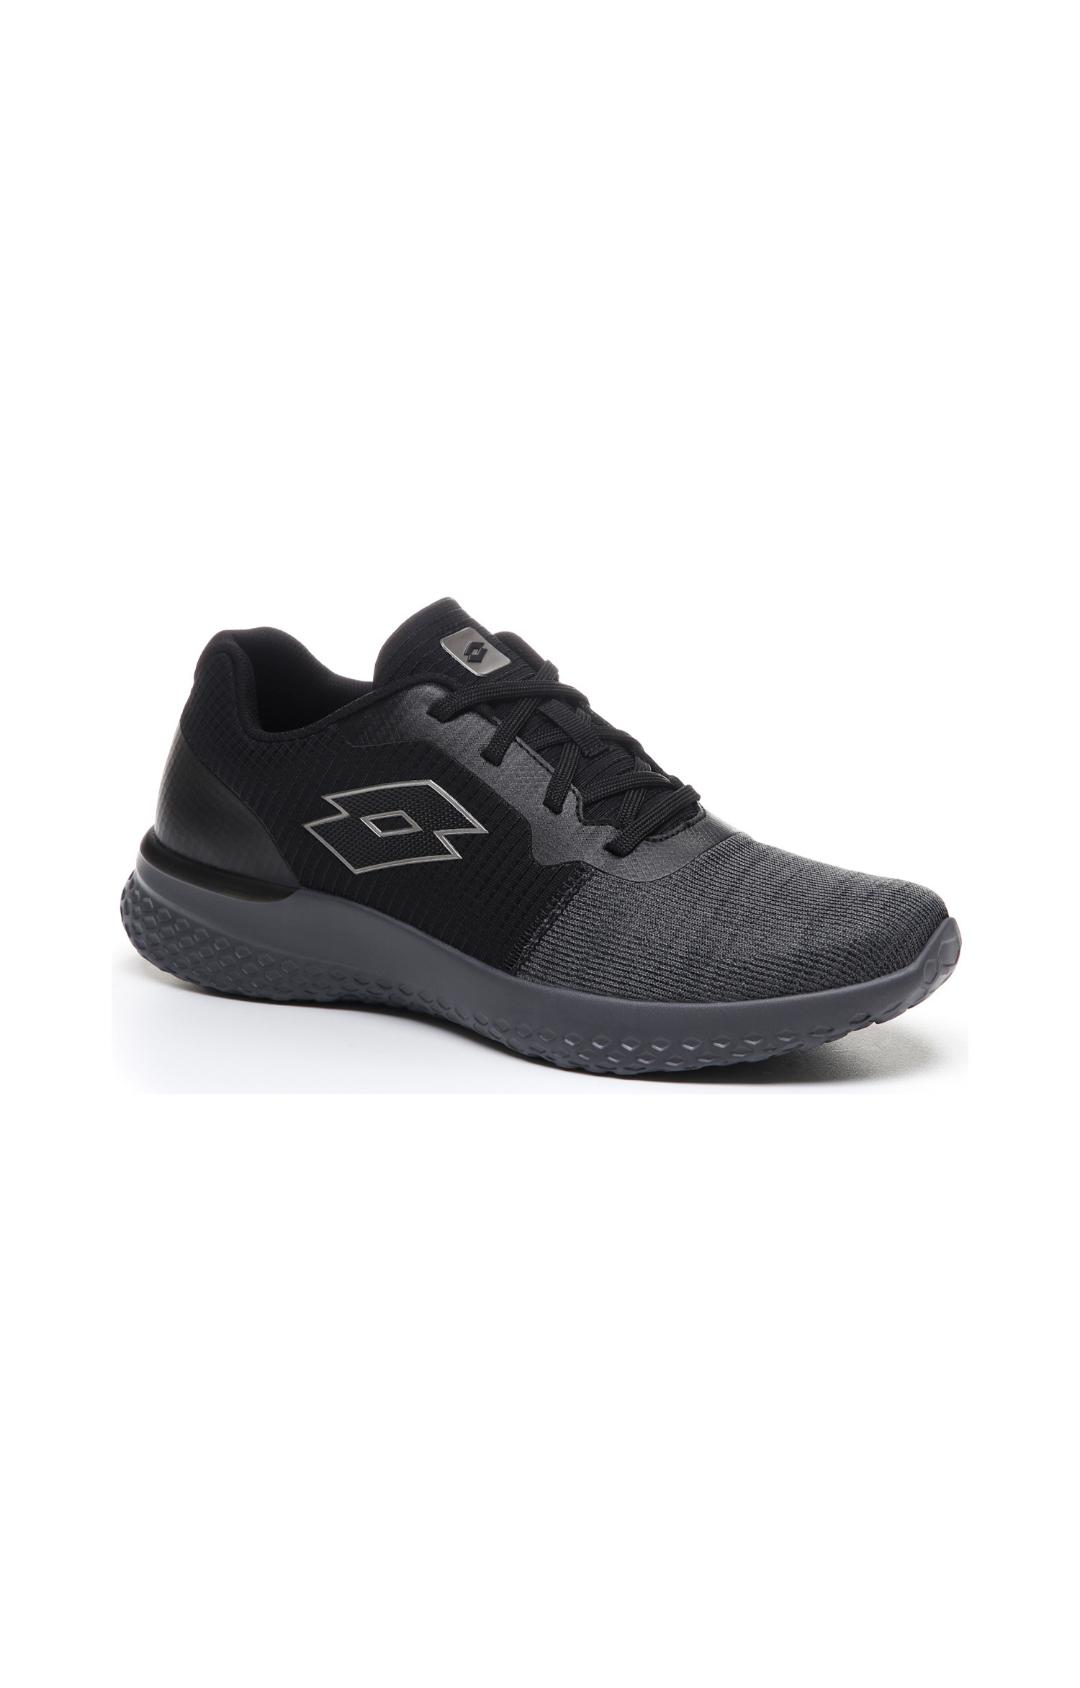 Lotto   Lotto Men's Evolight Ii Mlg All Black/Gravity Titan/Cool Gray 11C Training Shoes